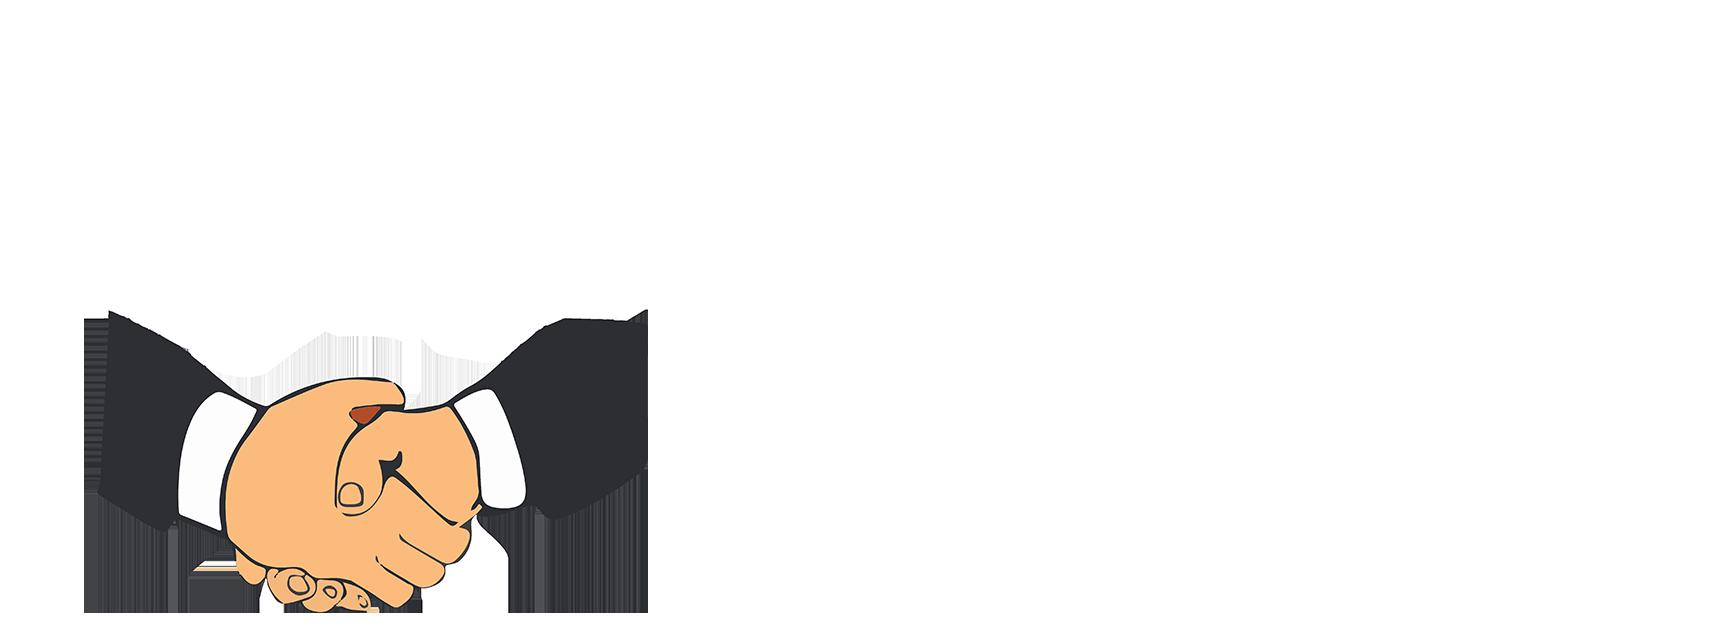 Agenzia Pino